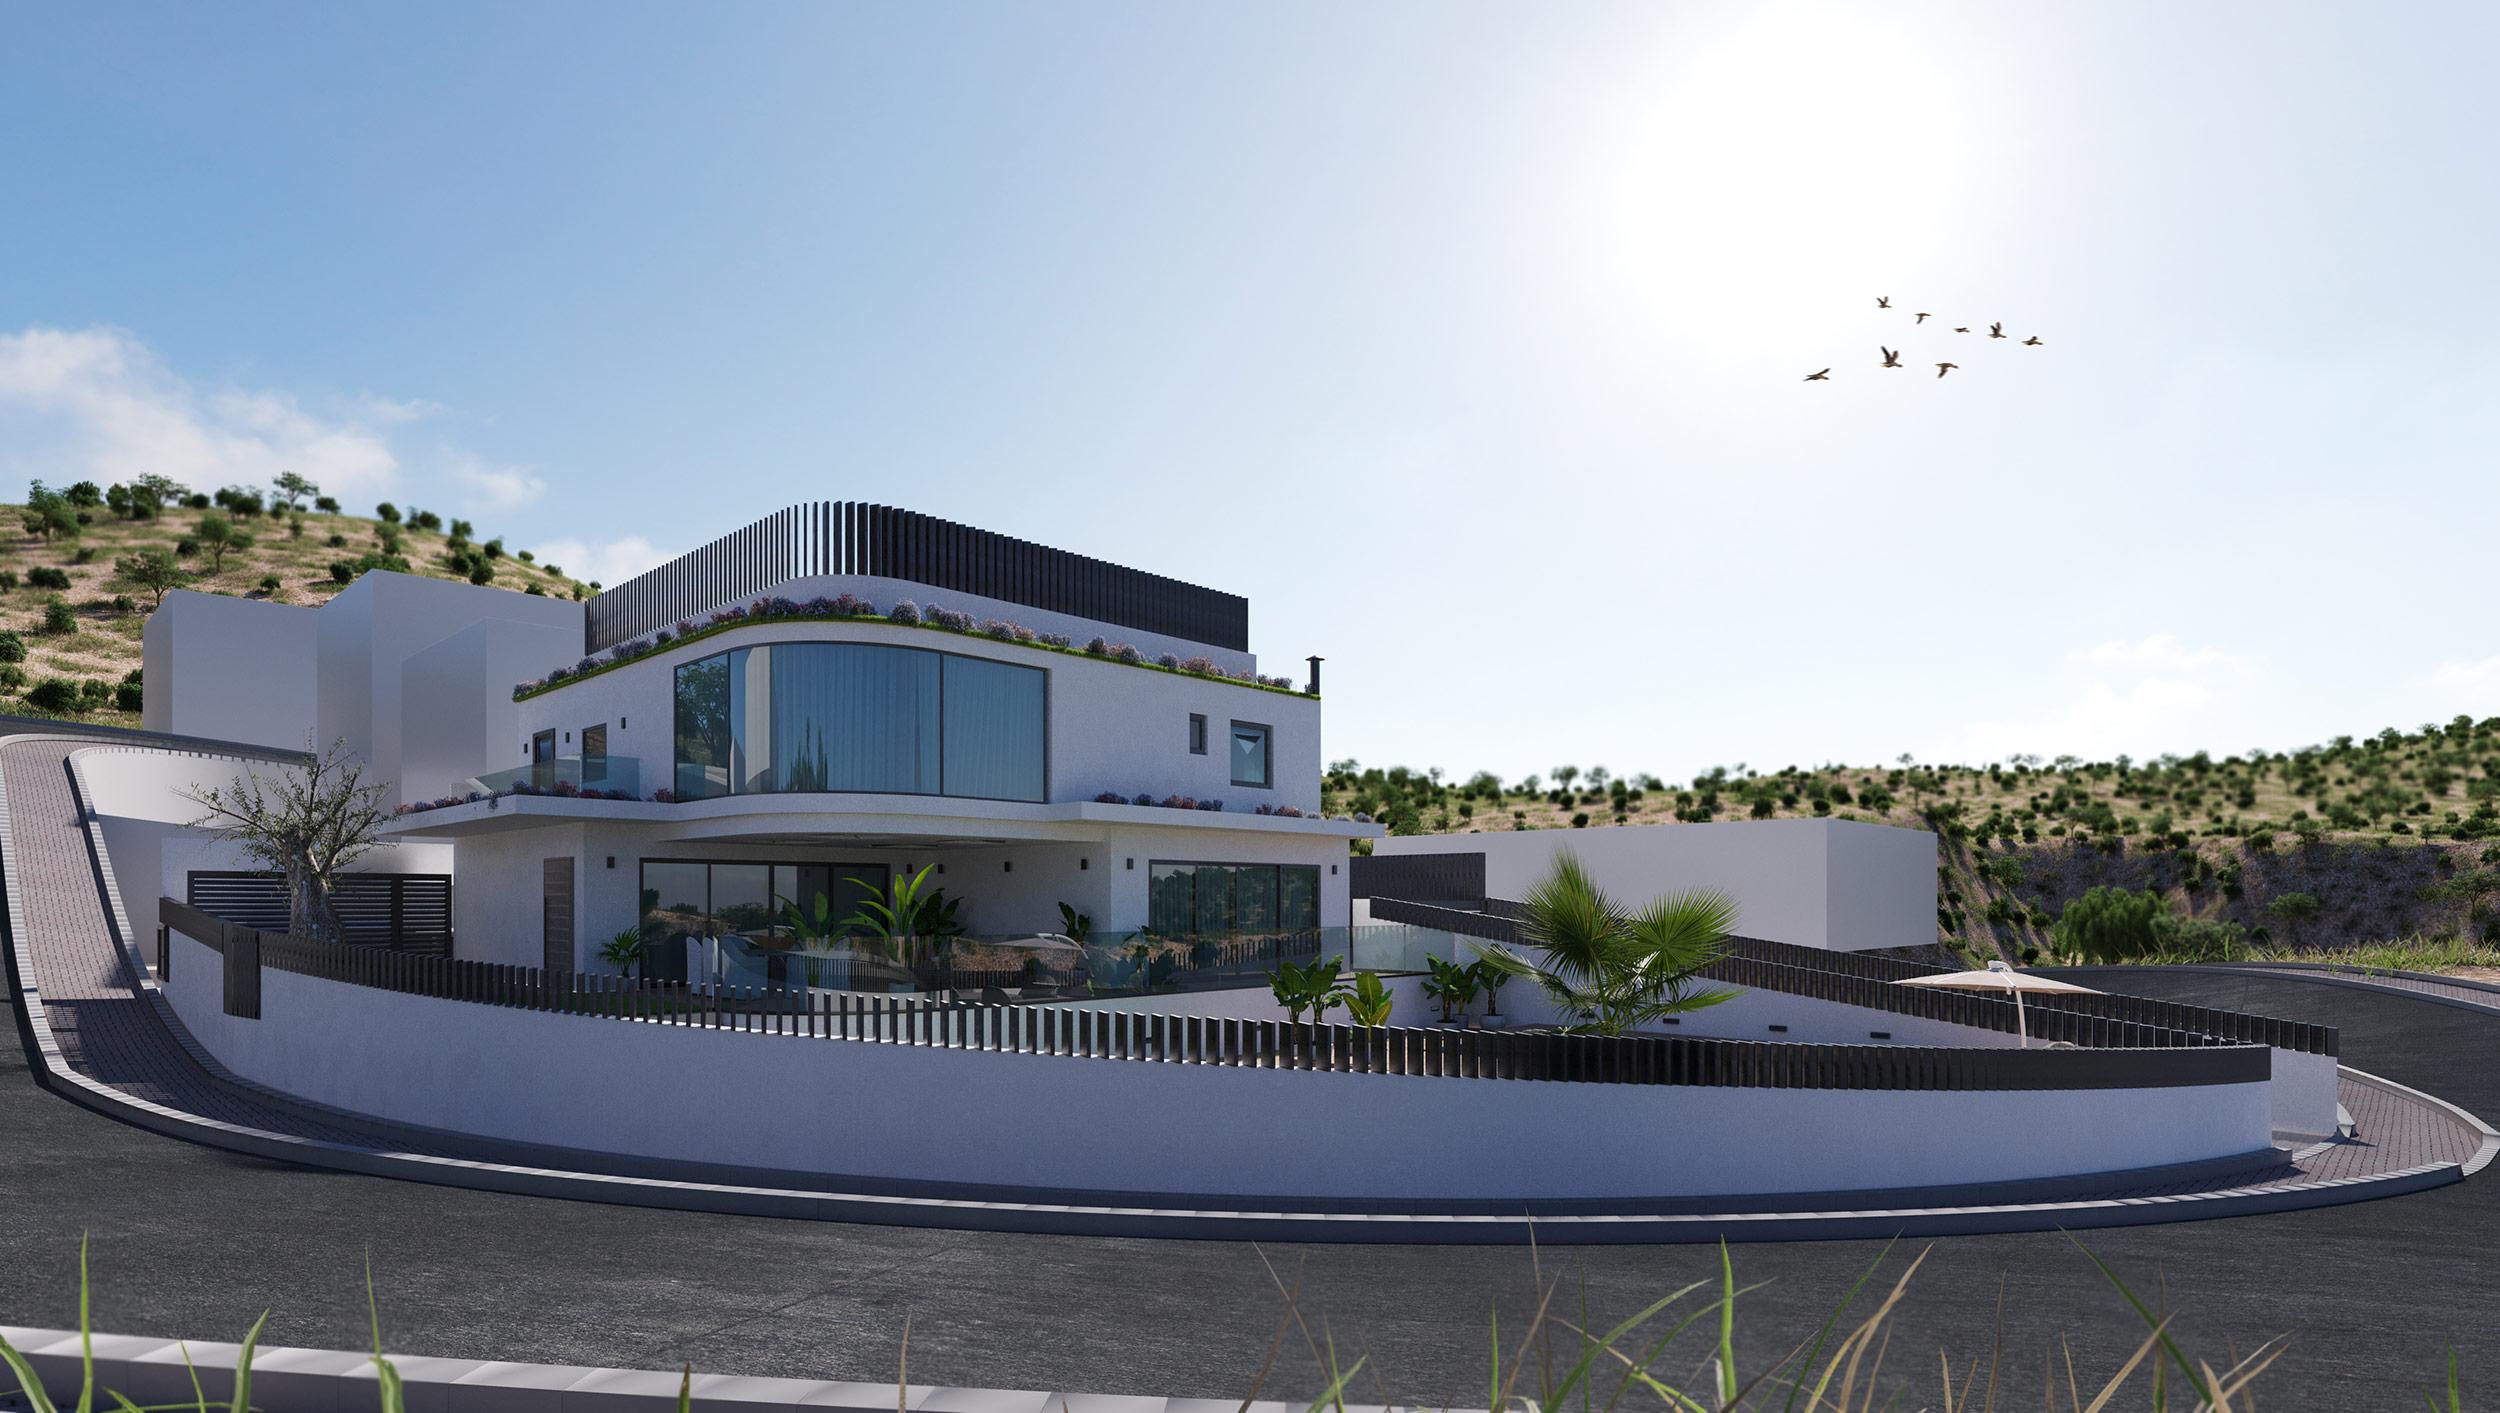 https://www.atelierzoz.com/wp-content/uploads/2020/12/atelierzoz-meadowview-villa-2.jpg